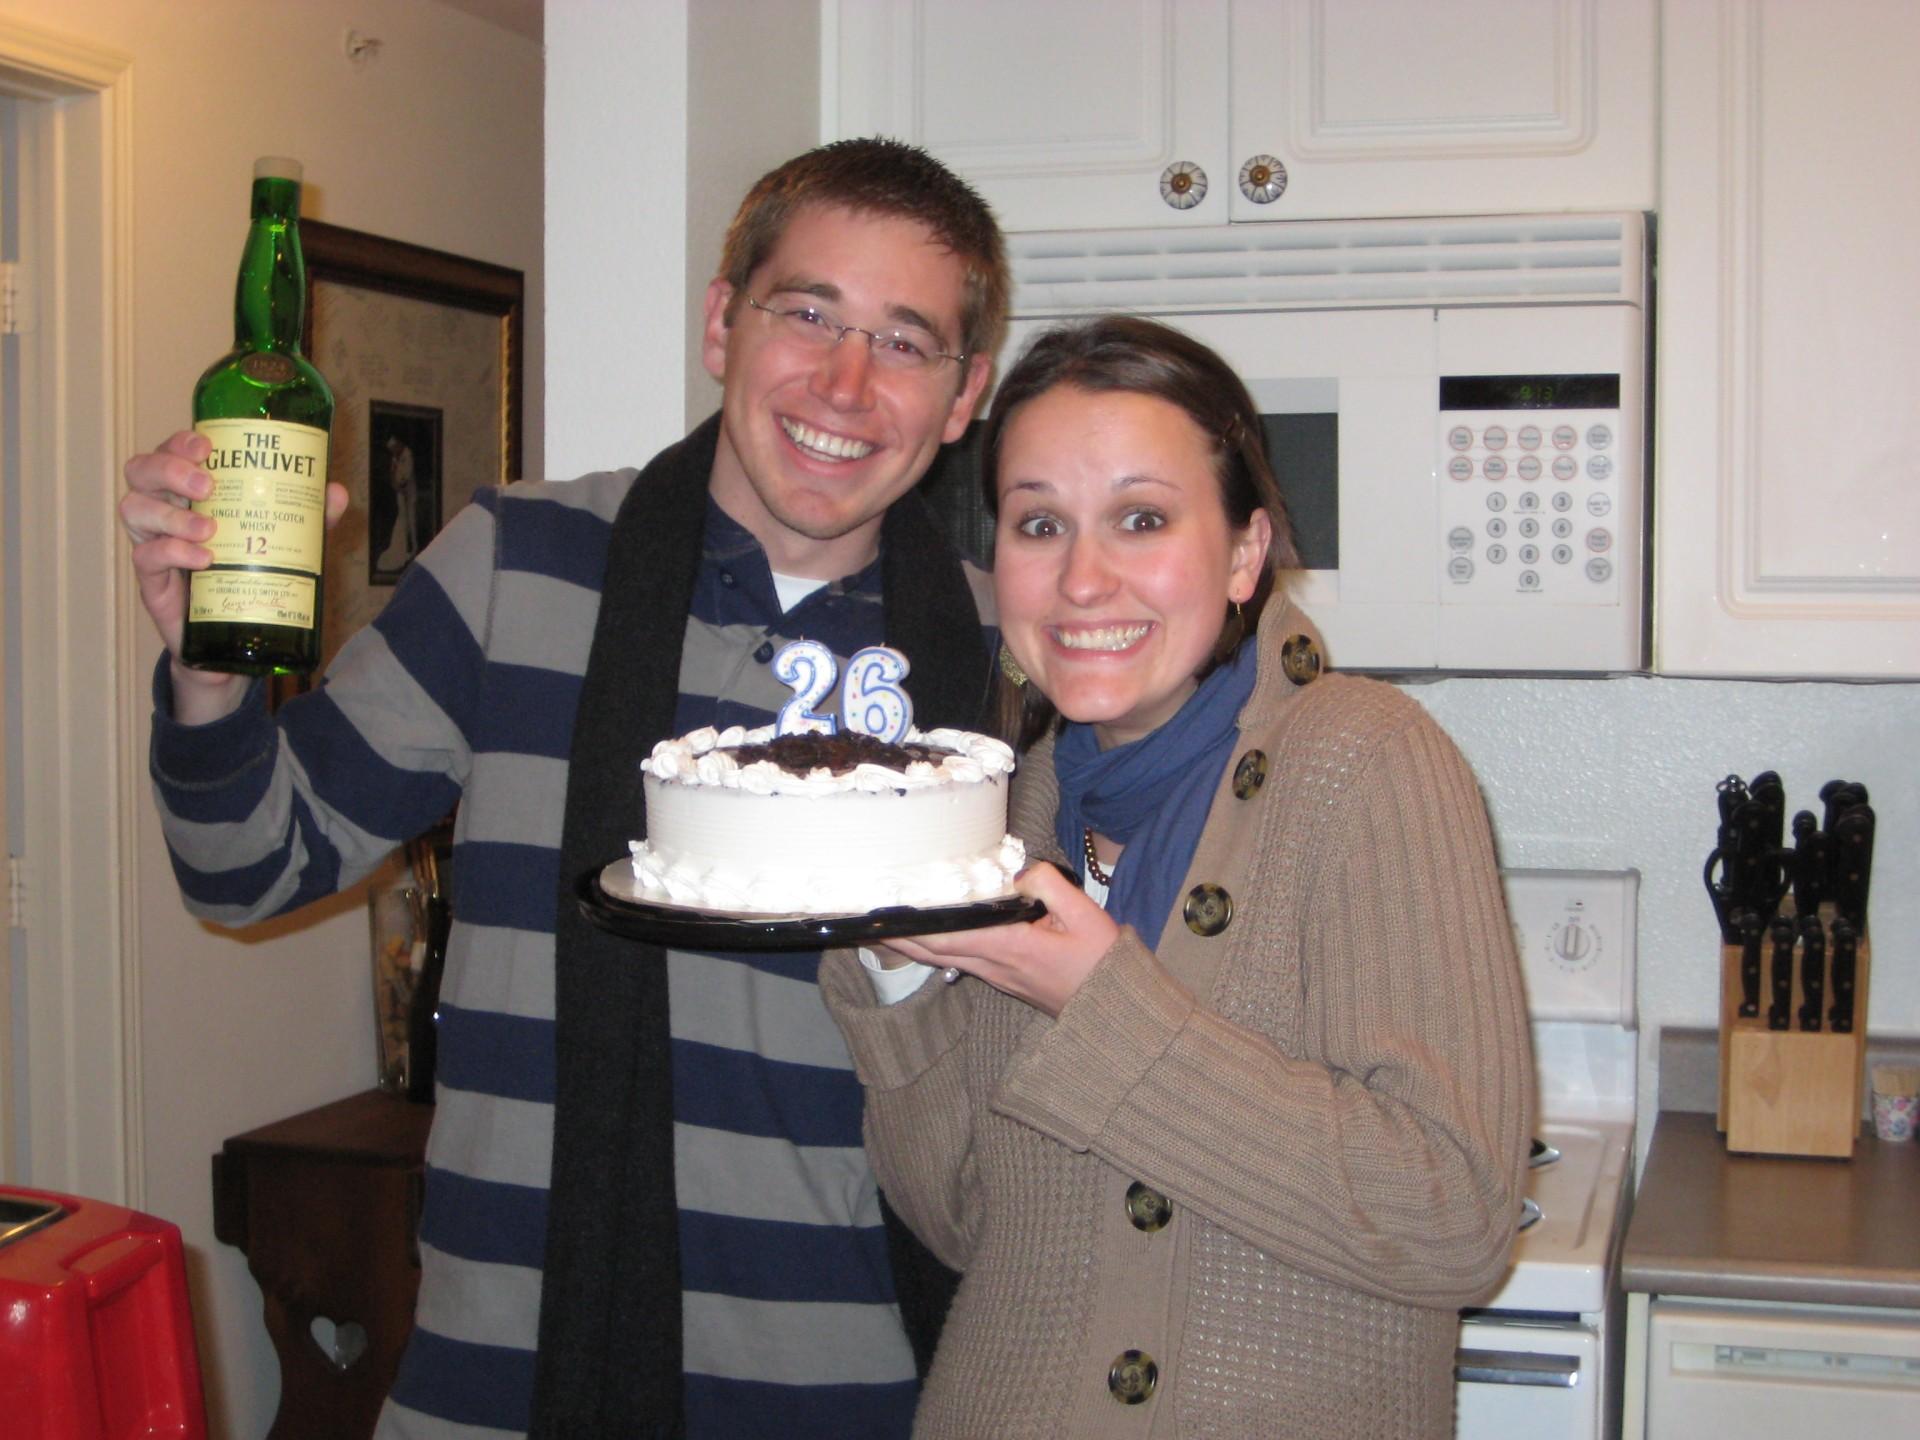 Joel brought the scotch